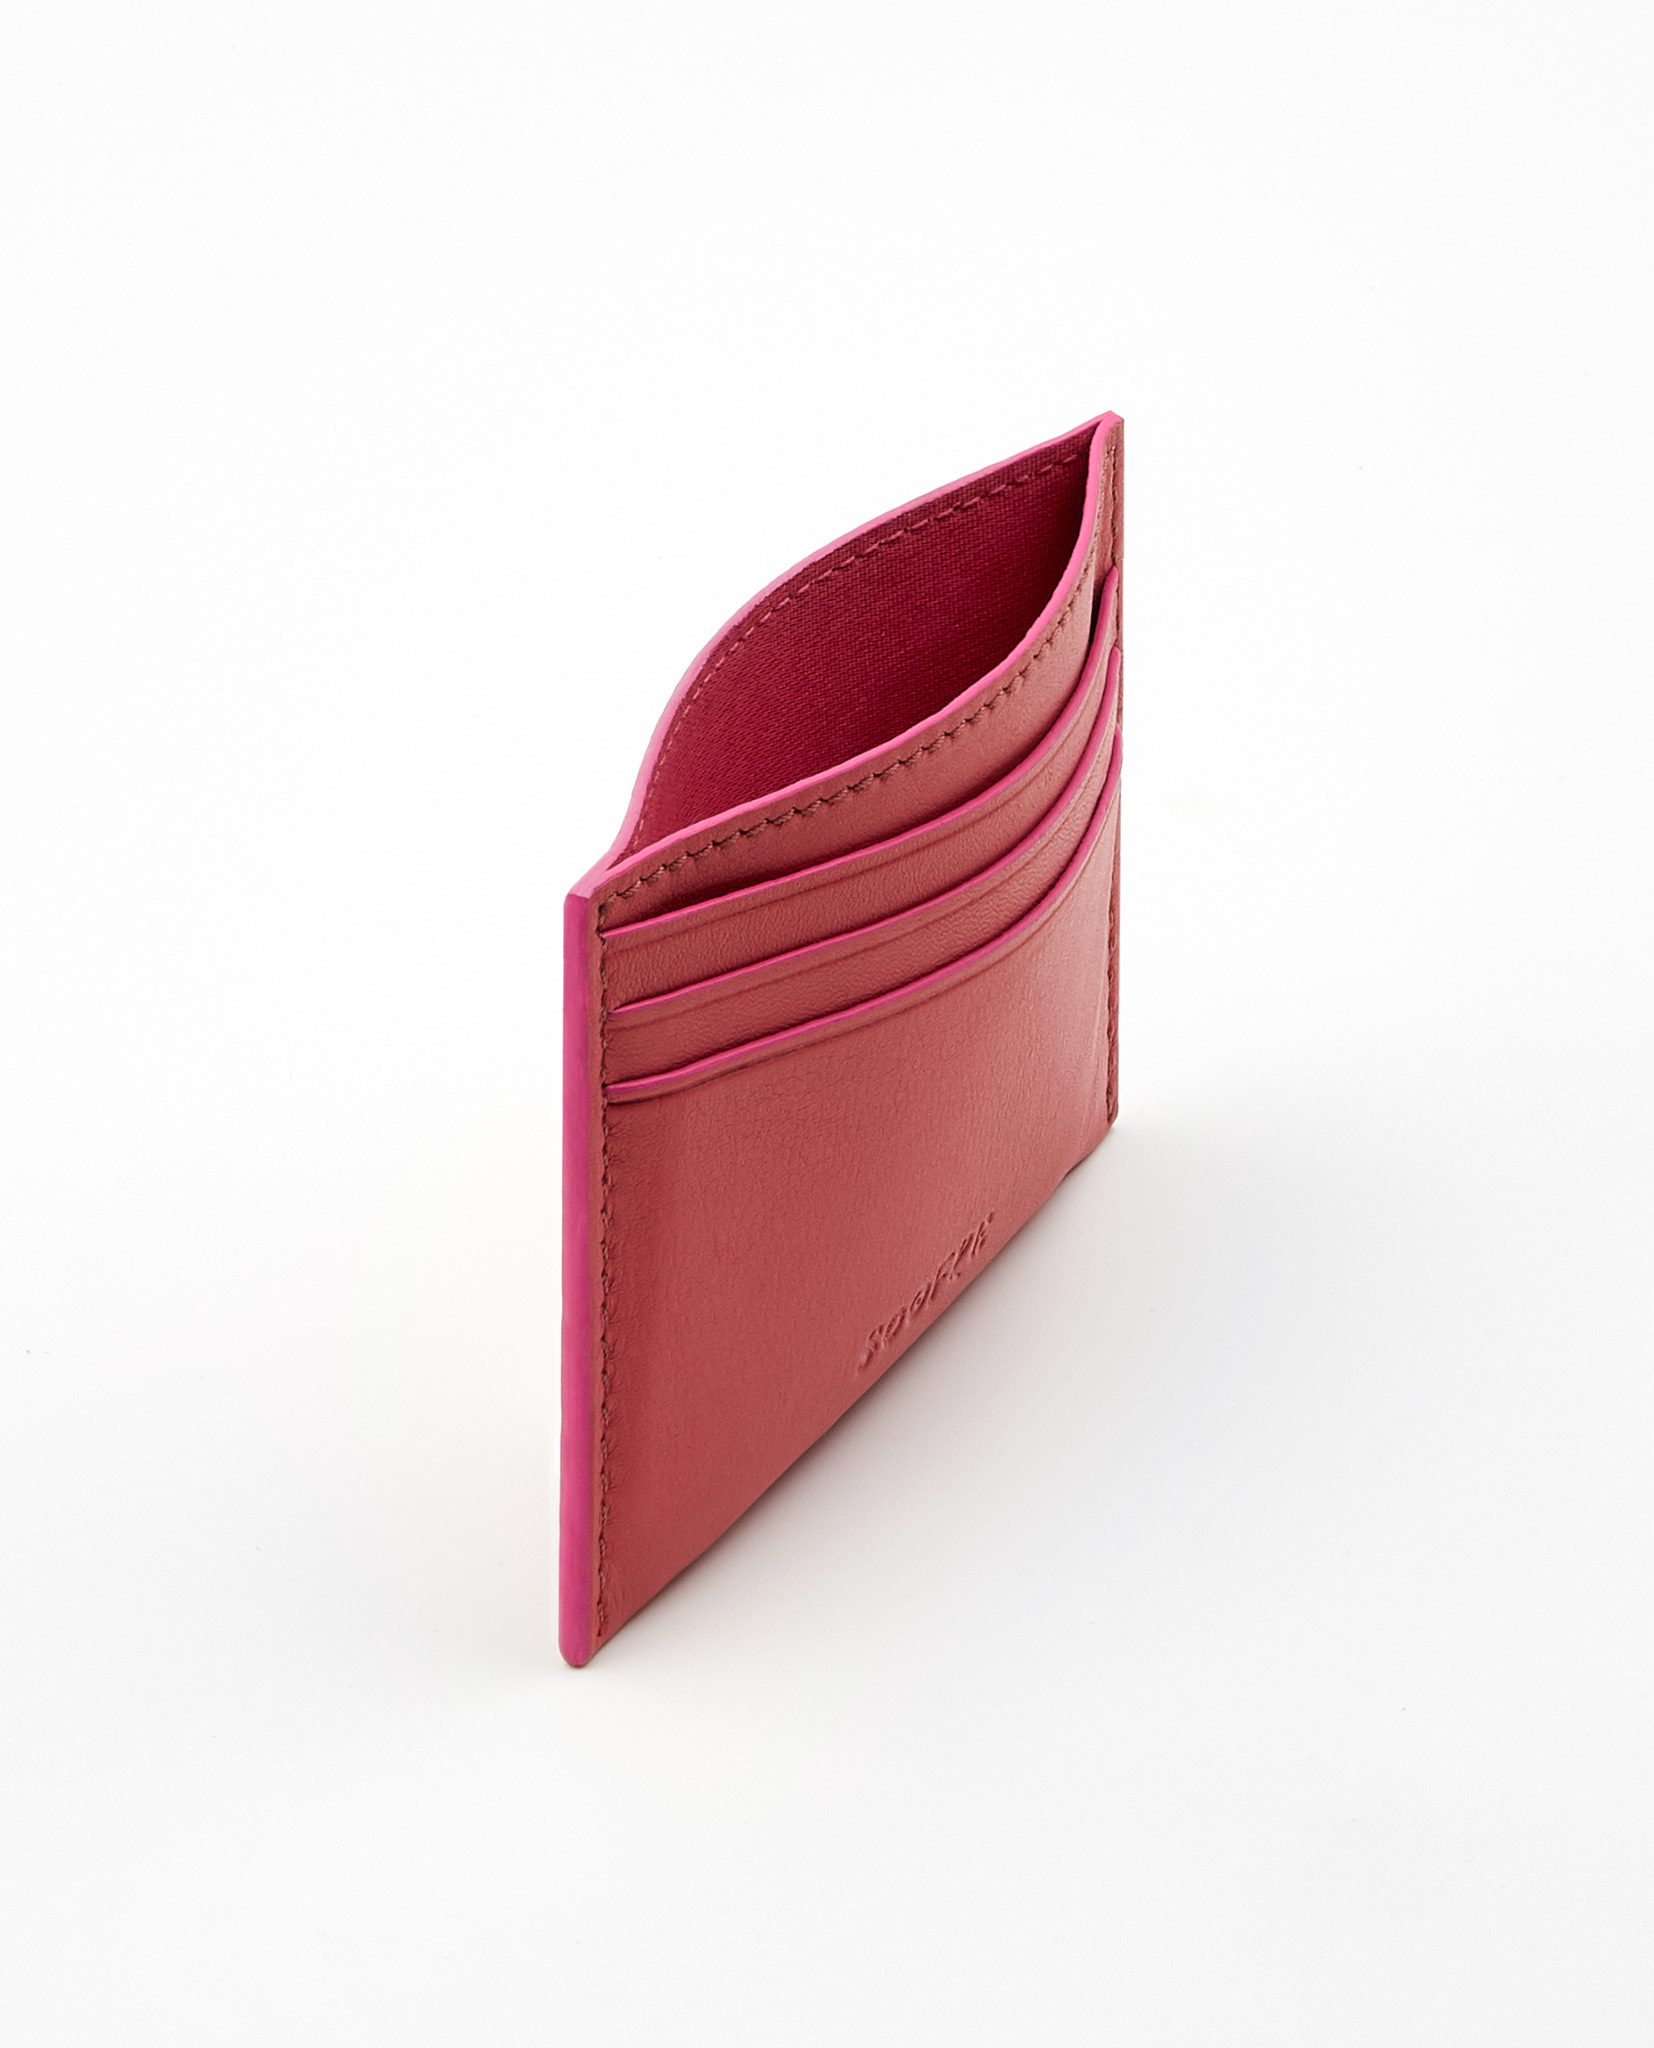 Soofre_Card-Holder_Coral-Fuchsia_2